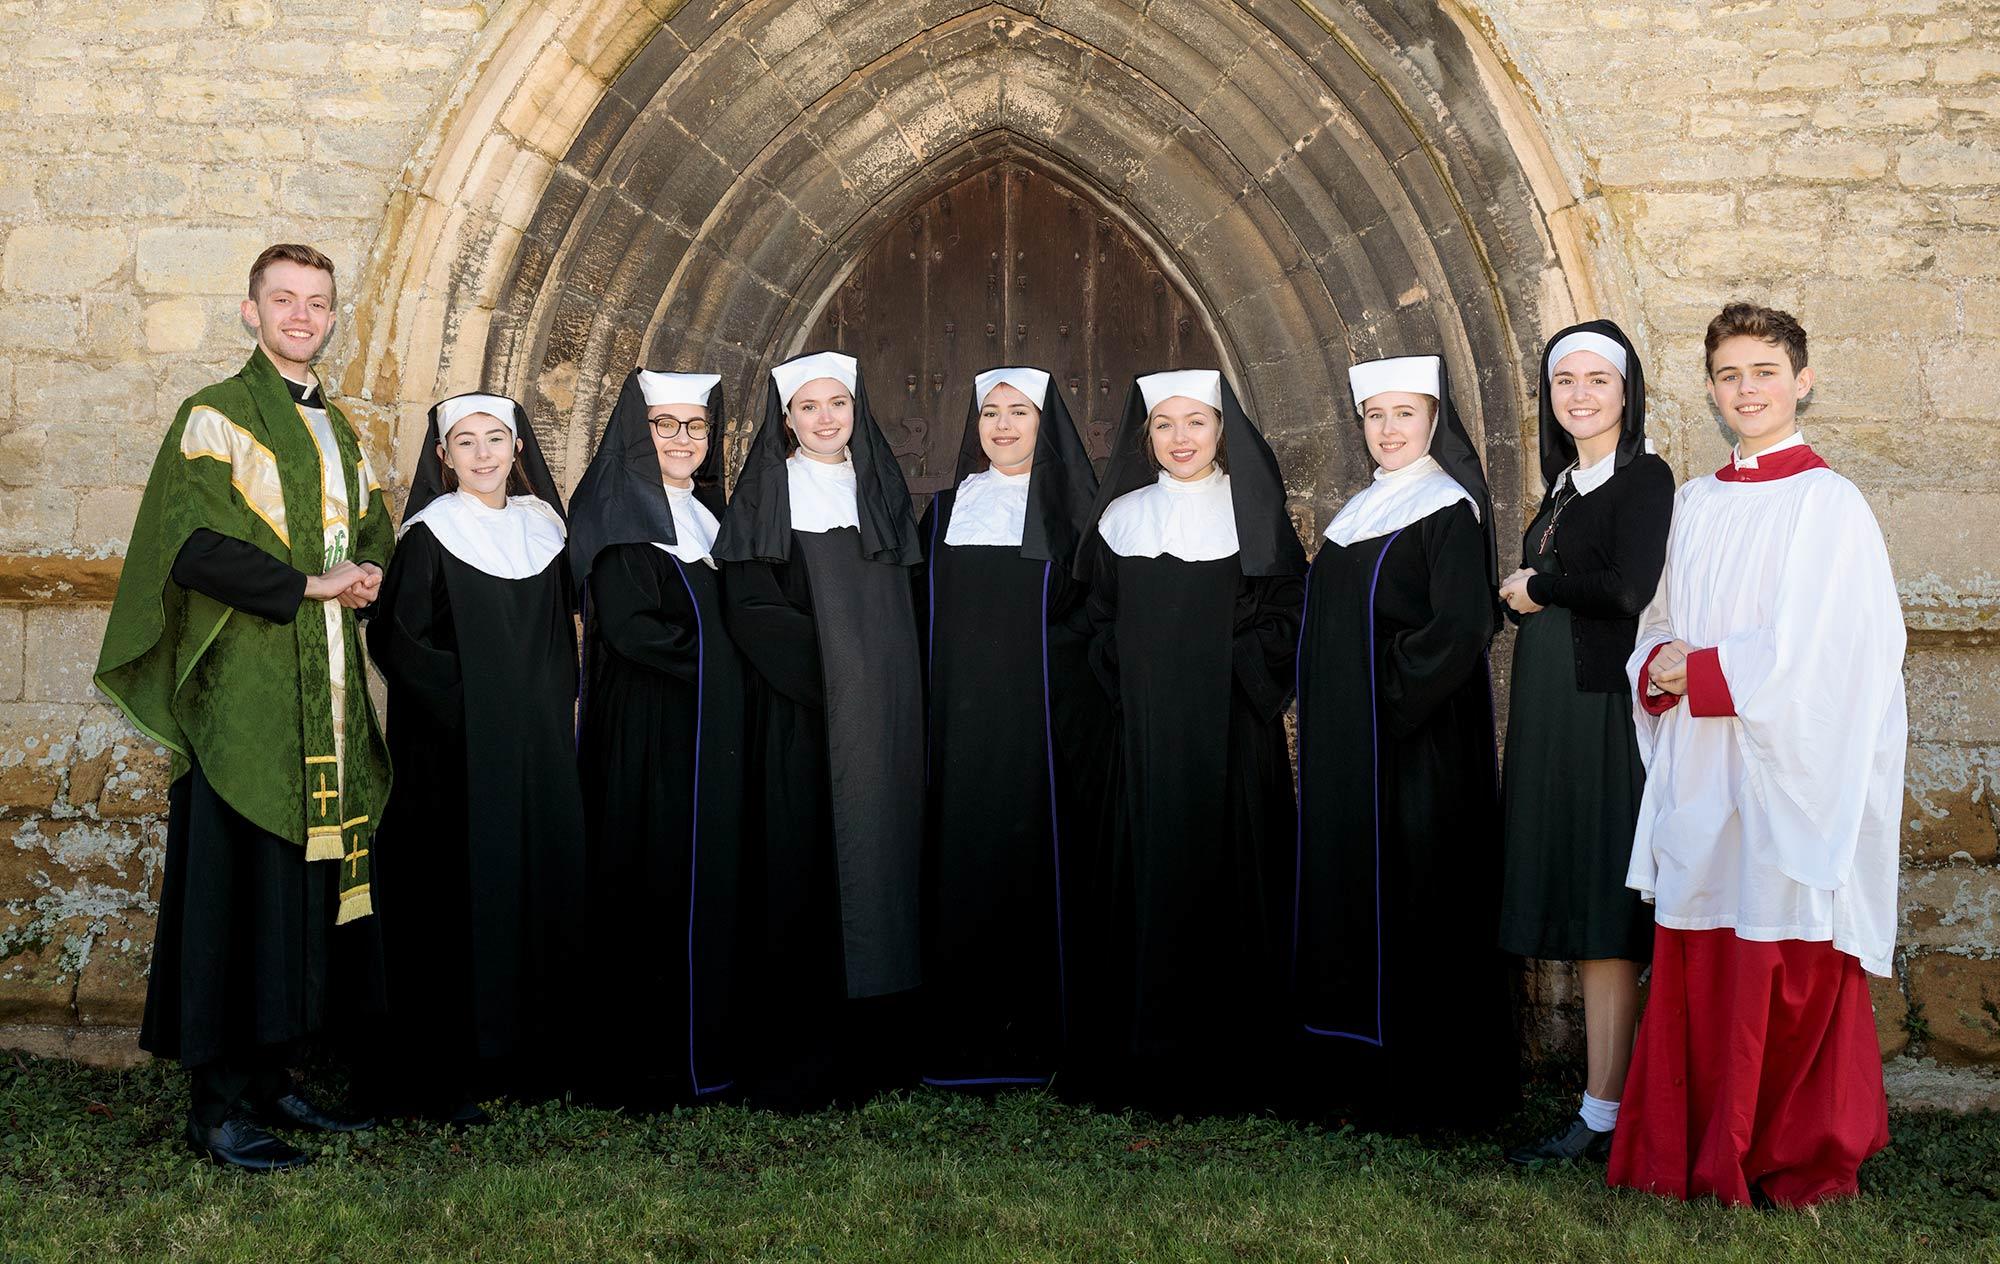 sister Act outside Spaldwick Church